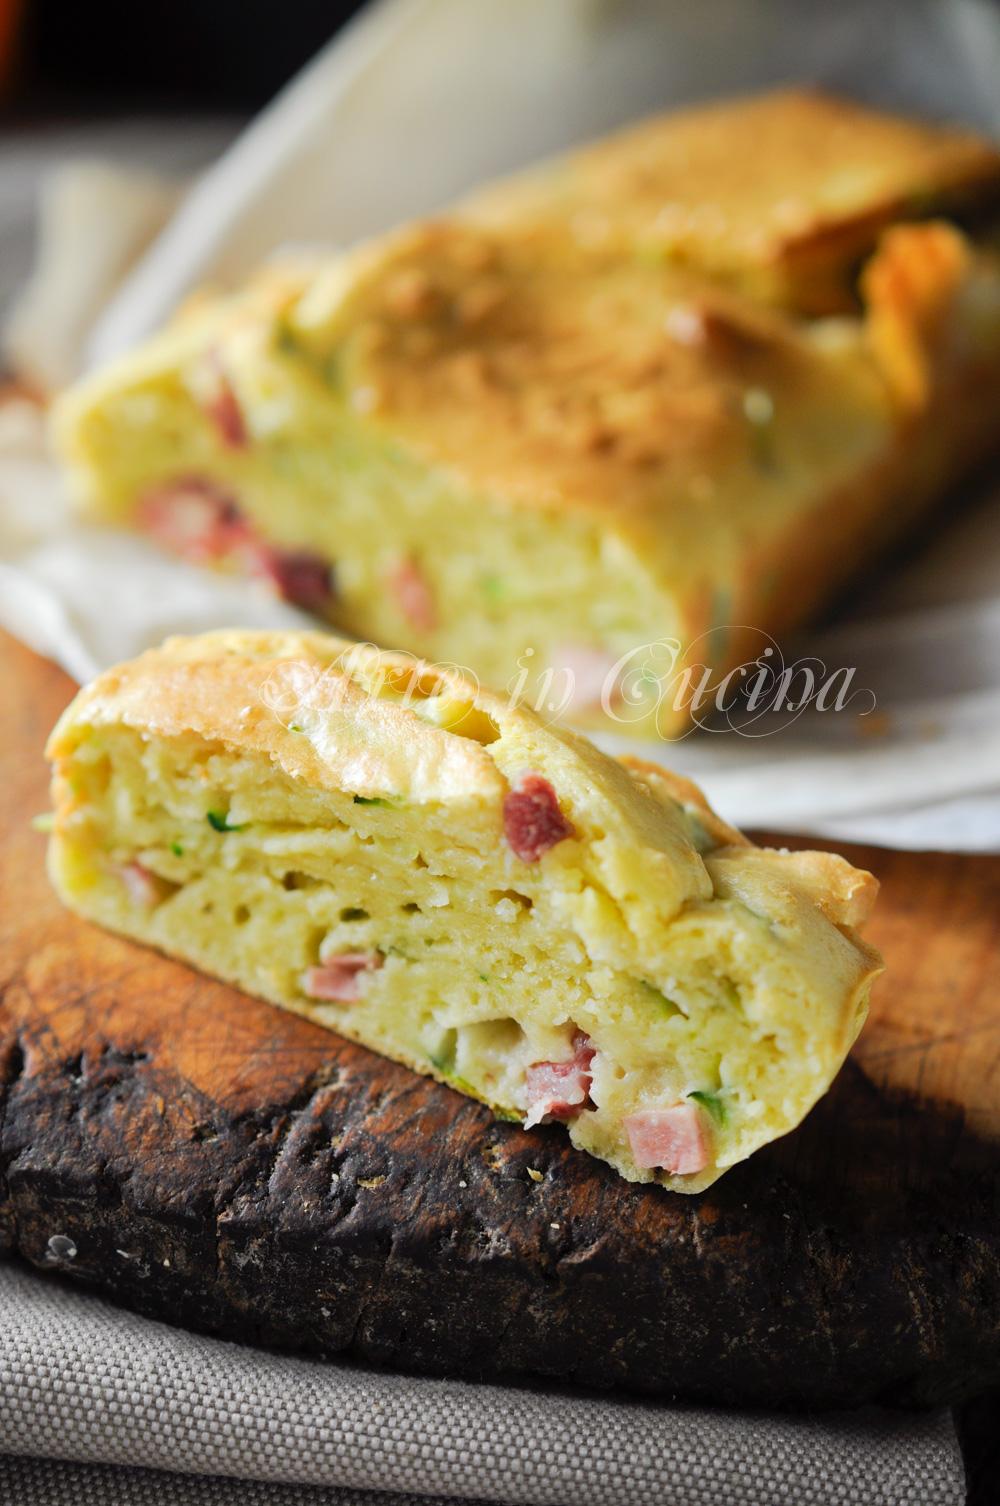 Plumcake con zucchine e salumi ricetta salata vickyart arte in cucina